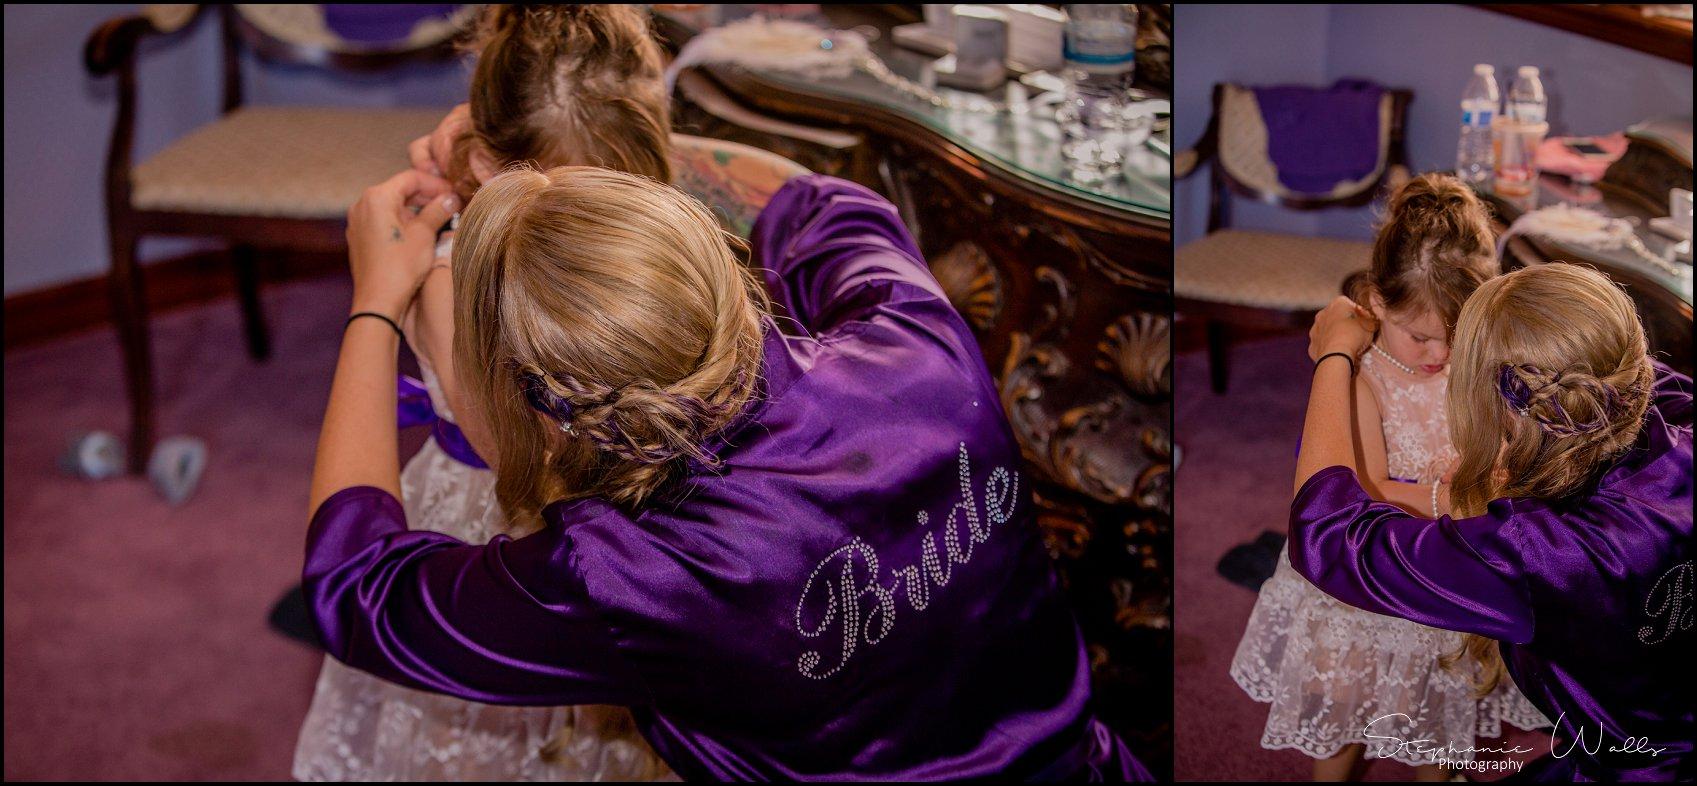 Everist Wedding 039 Patti & Bobbys | Troll Haven Castle & Bandy Farms | Sequim, Wa Wedding Photographer